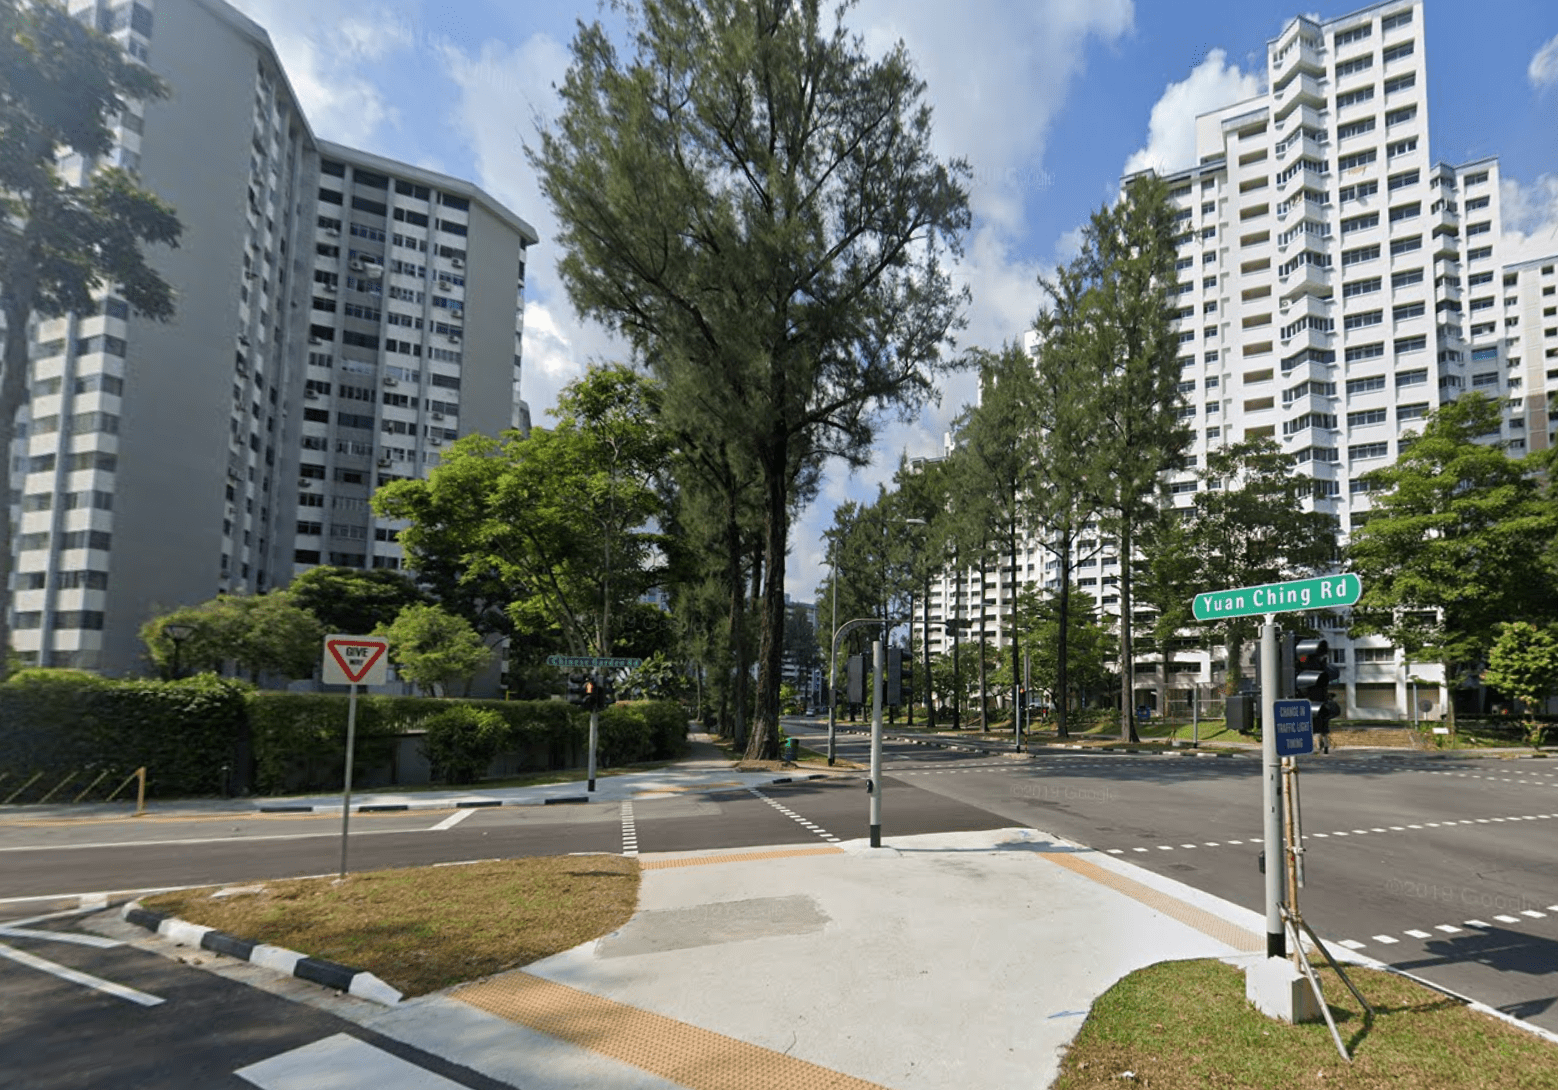 bicycle hits man pavement